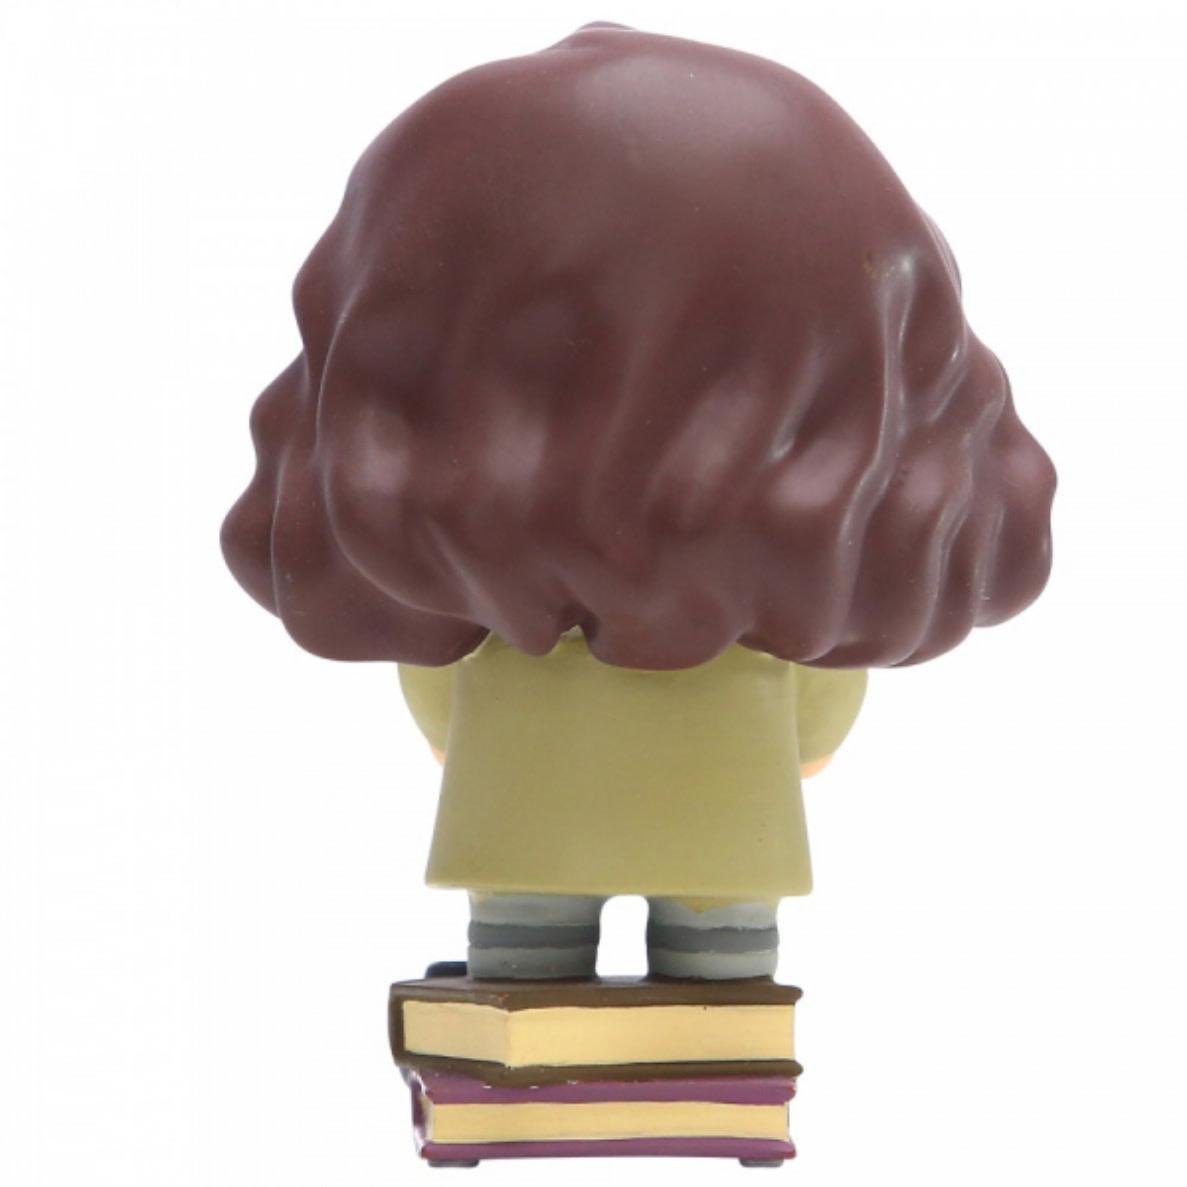 enesco Harry Potter : Sirius Charm Figurine